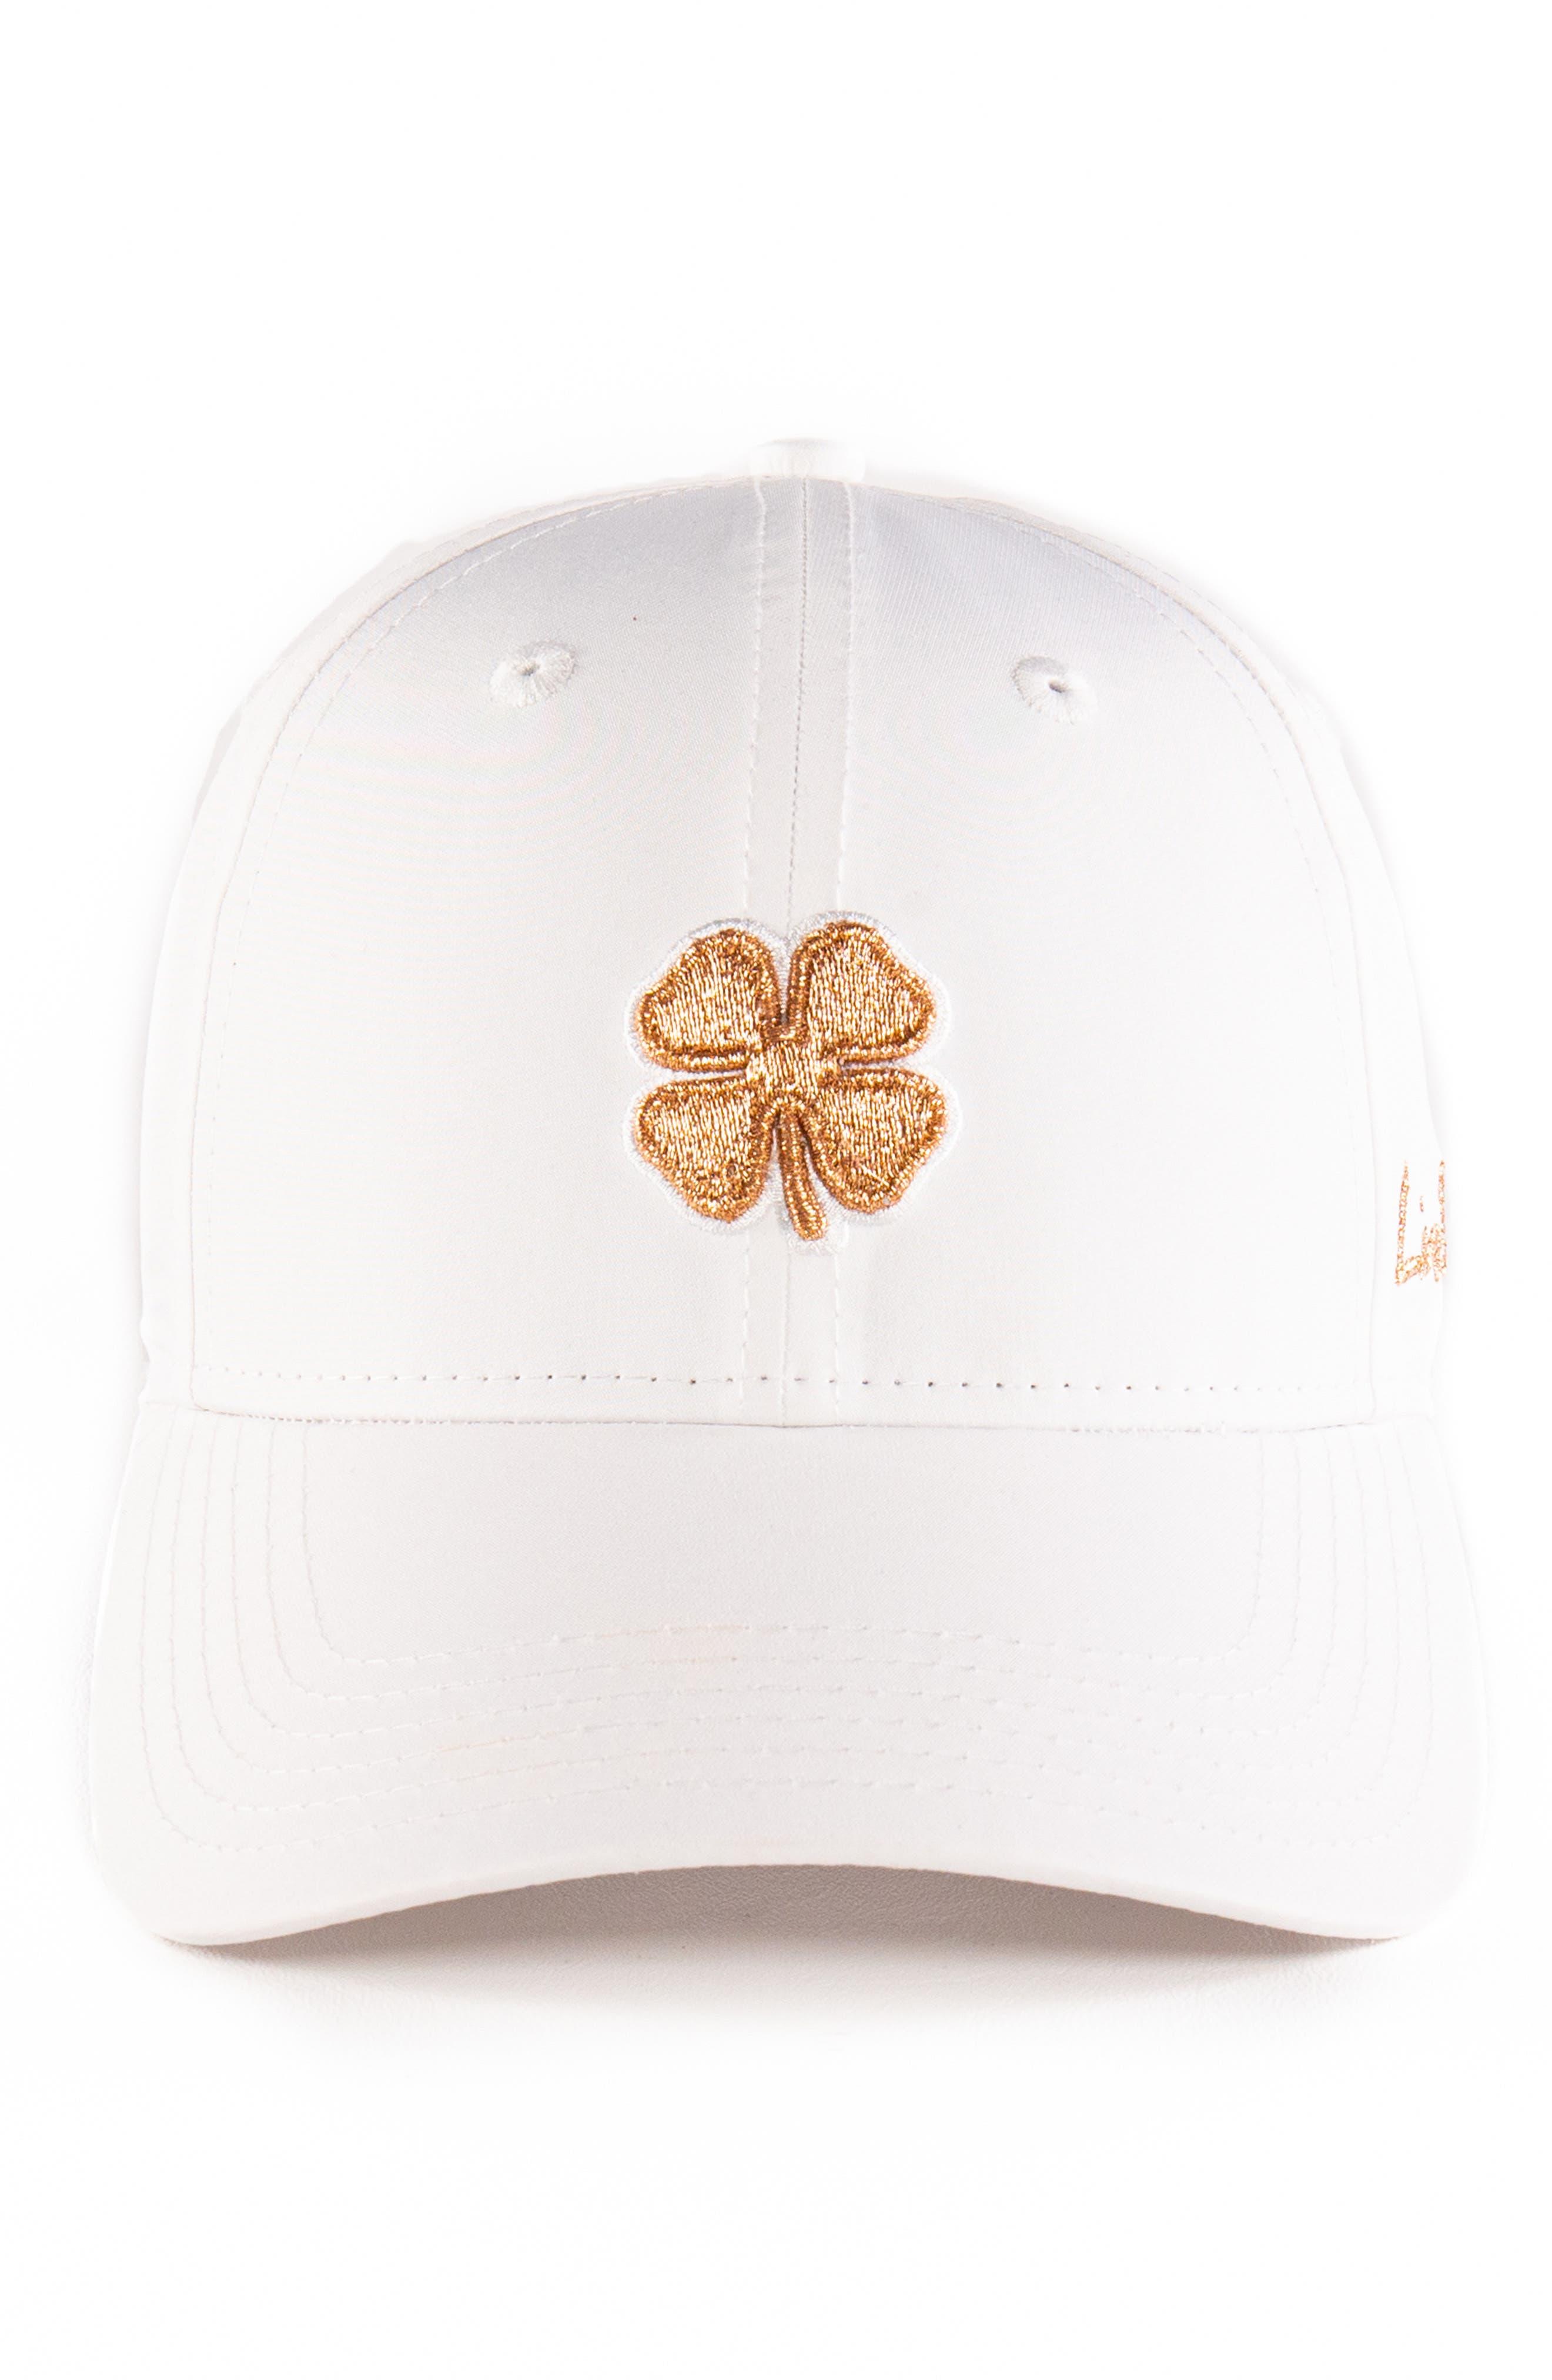 Hollywood 1 Ball Cap